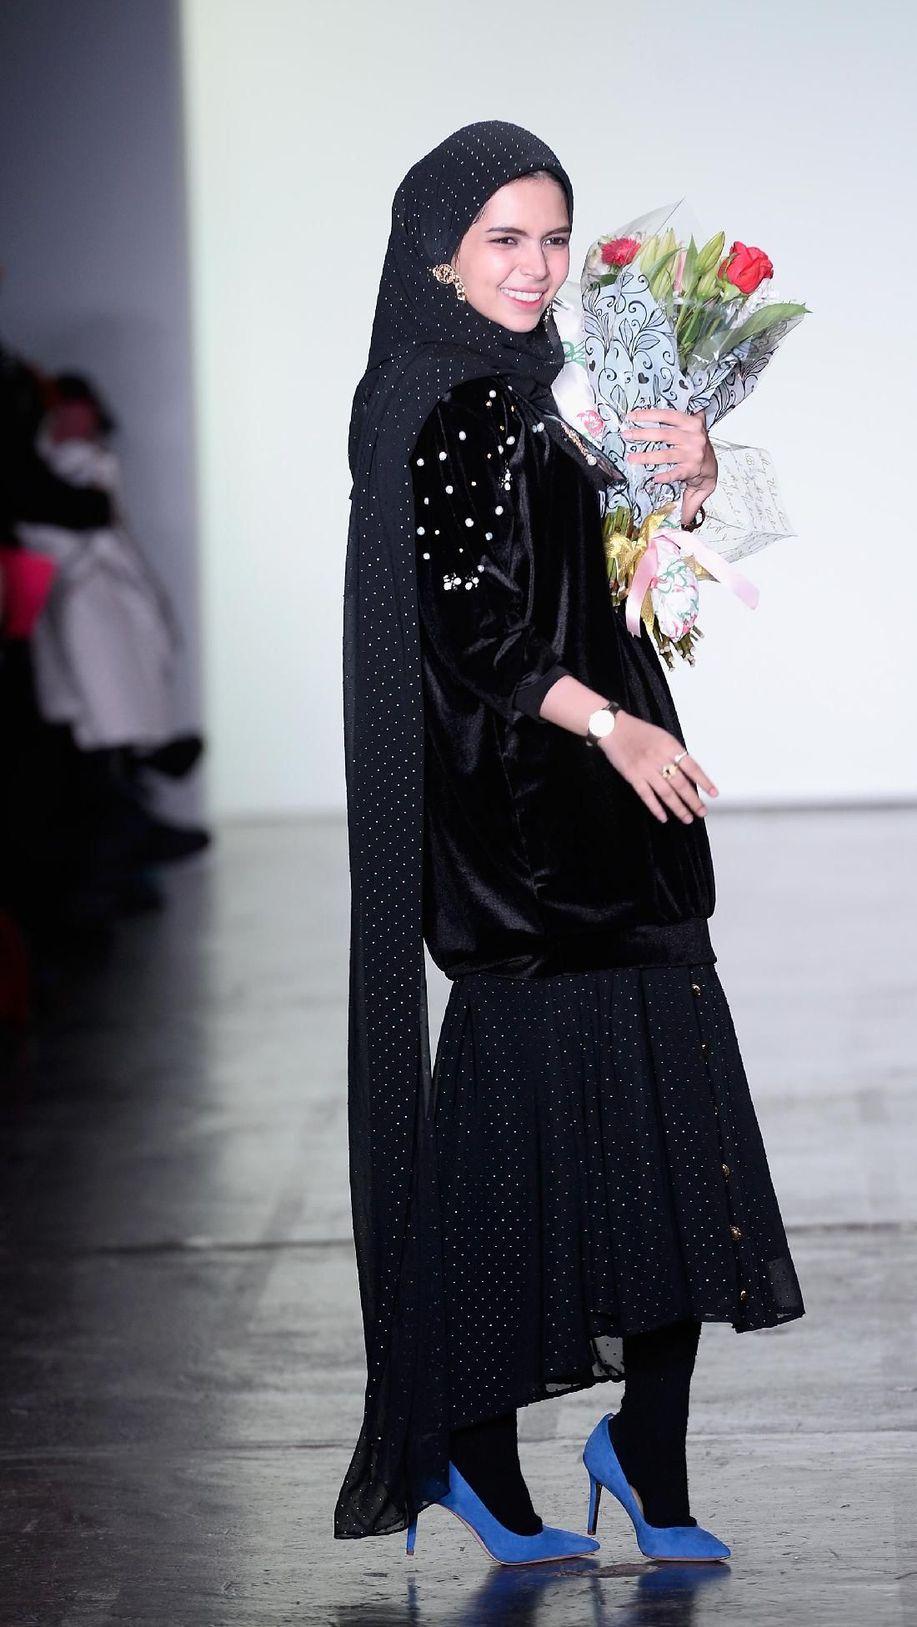 Glamor Tapi Sopan, Inspirasi Gaya Hijab ke Fashion Week Ala Vivi Zubedi https://t.co/NY7VilvBxE via @wolipop https://t.co/AaoyjHWYkA